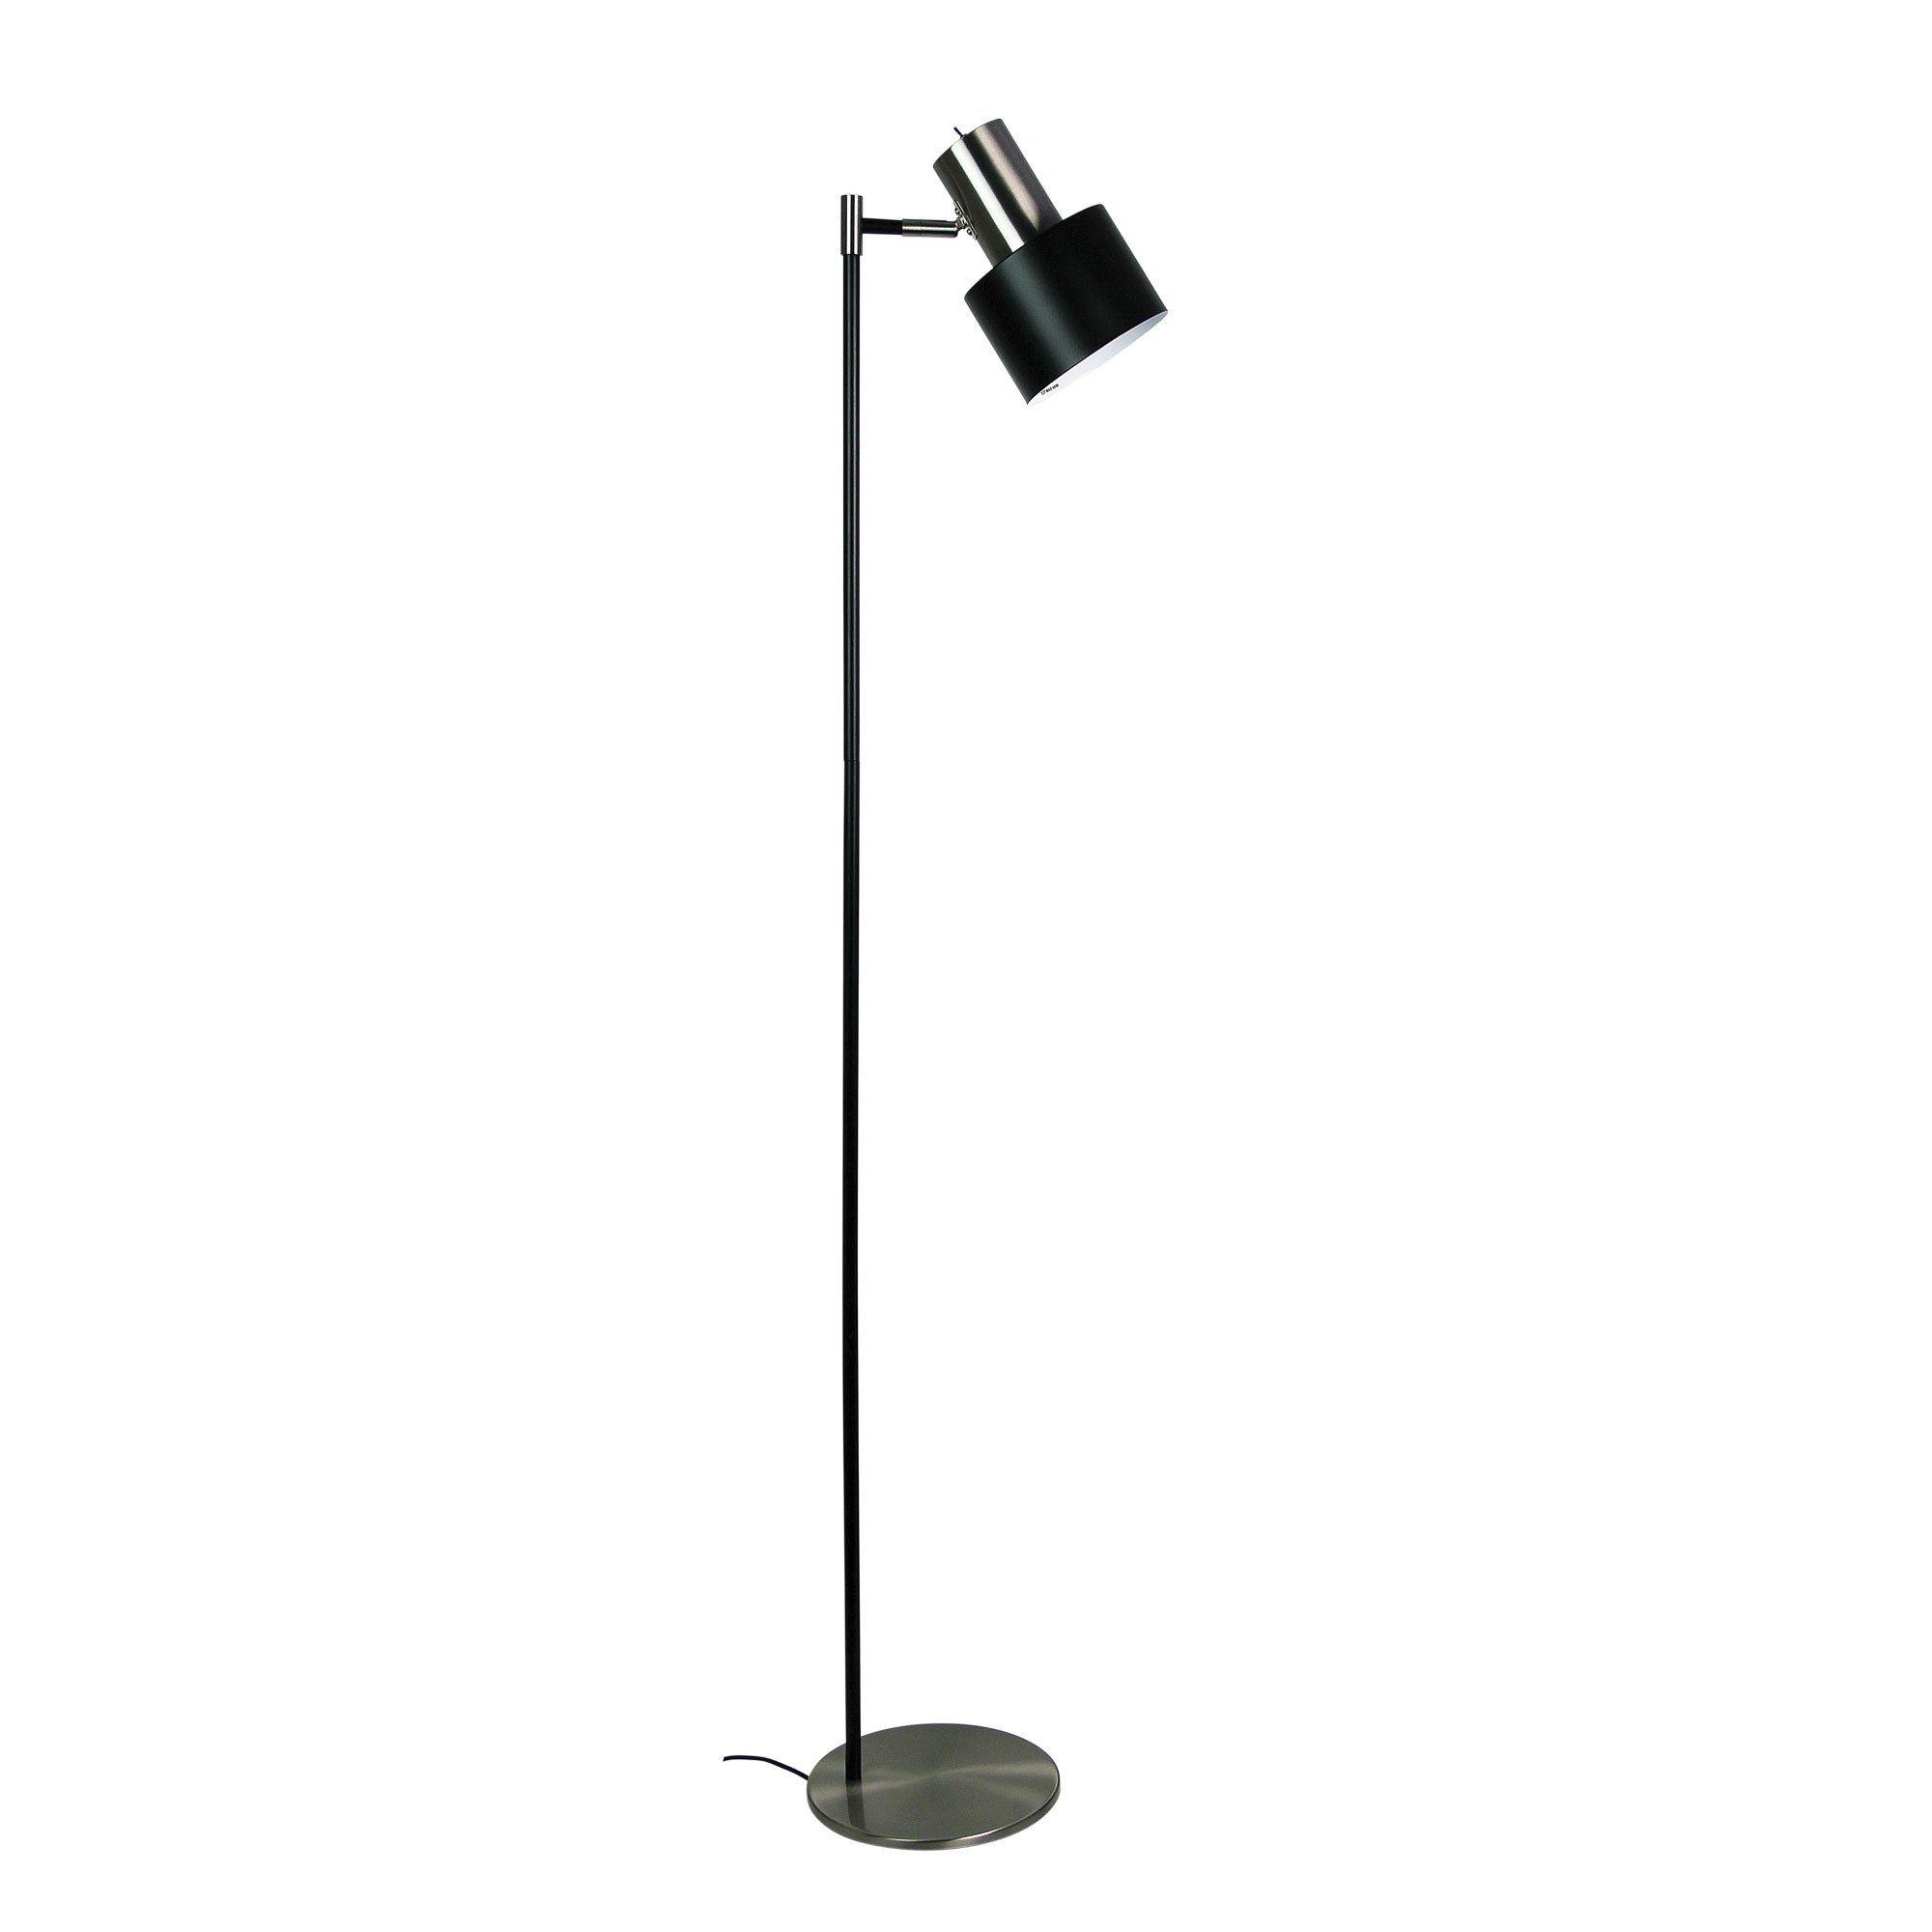 Ari Single Floor Lamp Range - Brushed Chrome / 5W Fancy Round S45 3000K Warm-White 420-Lumens